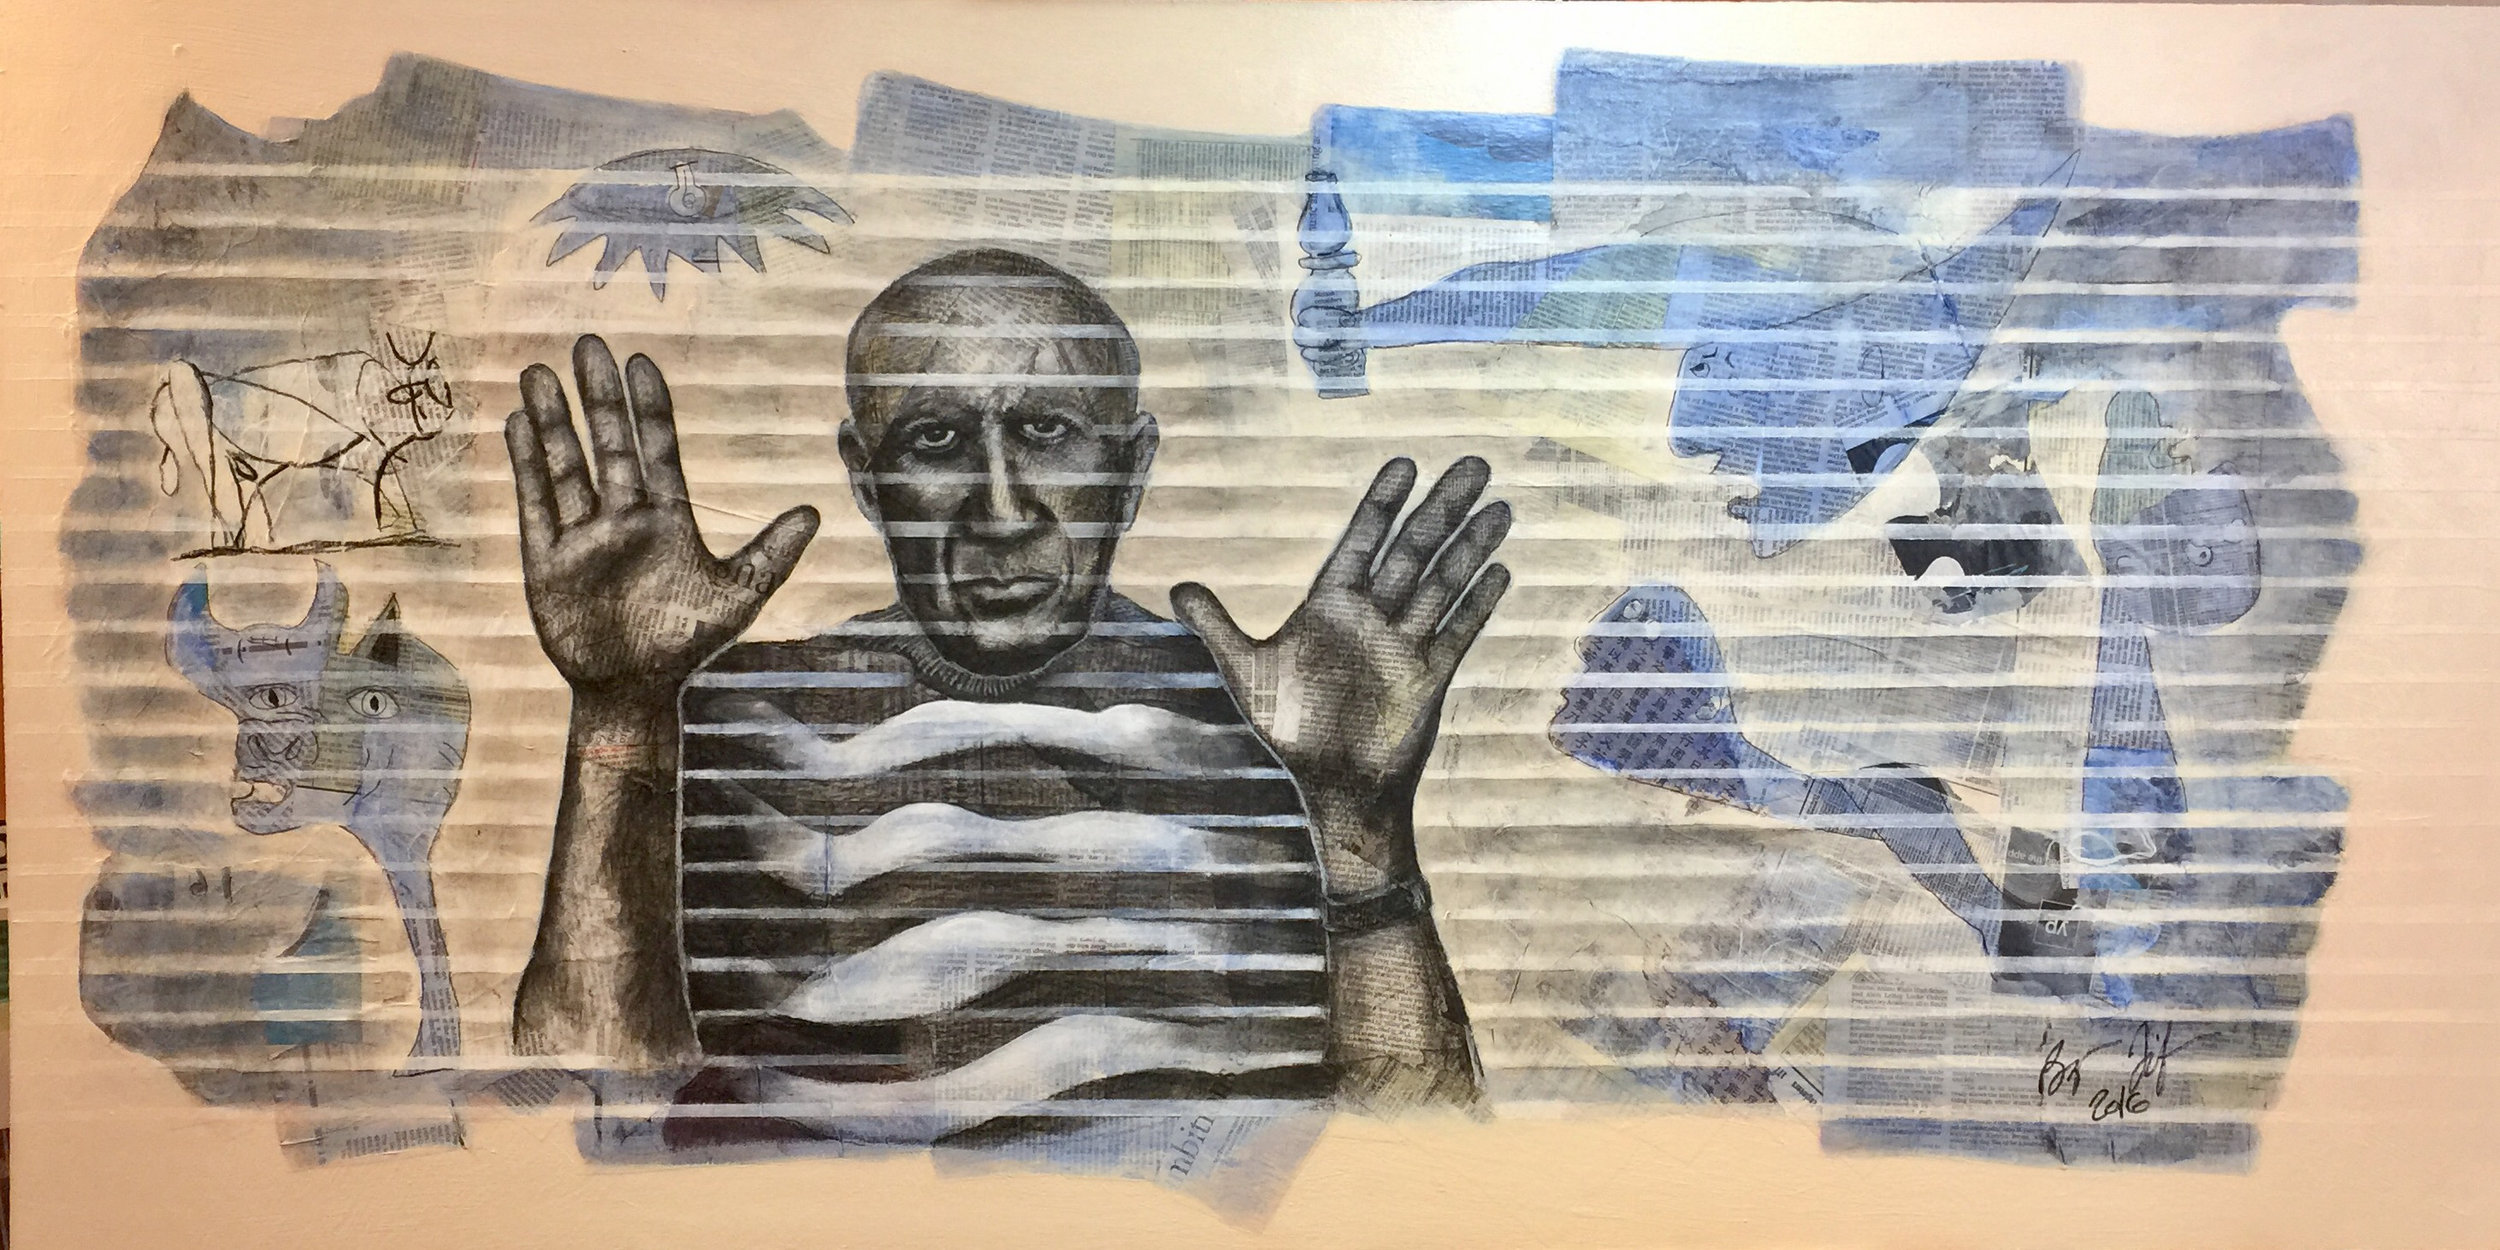 Picasso Vision